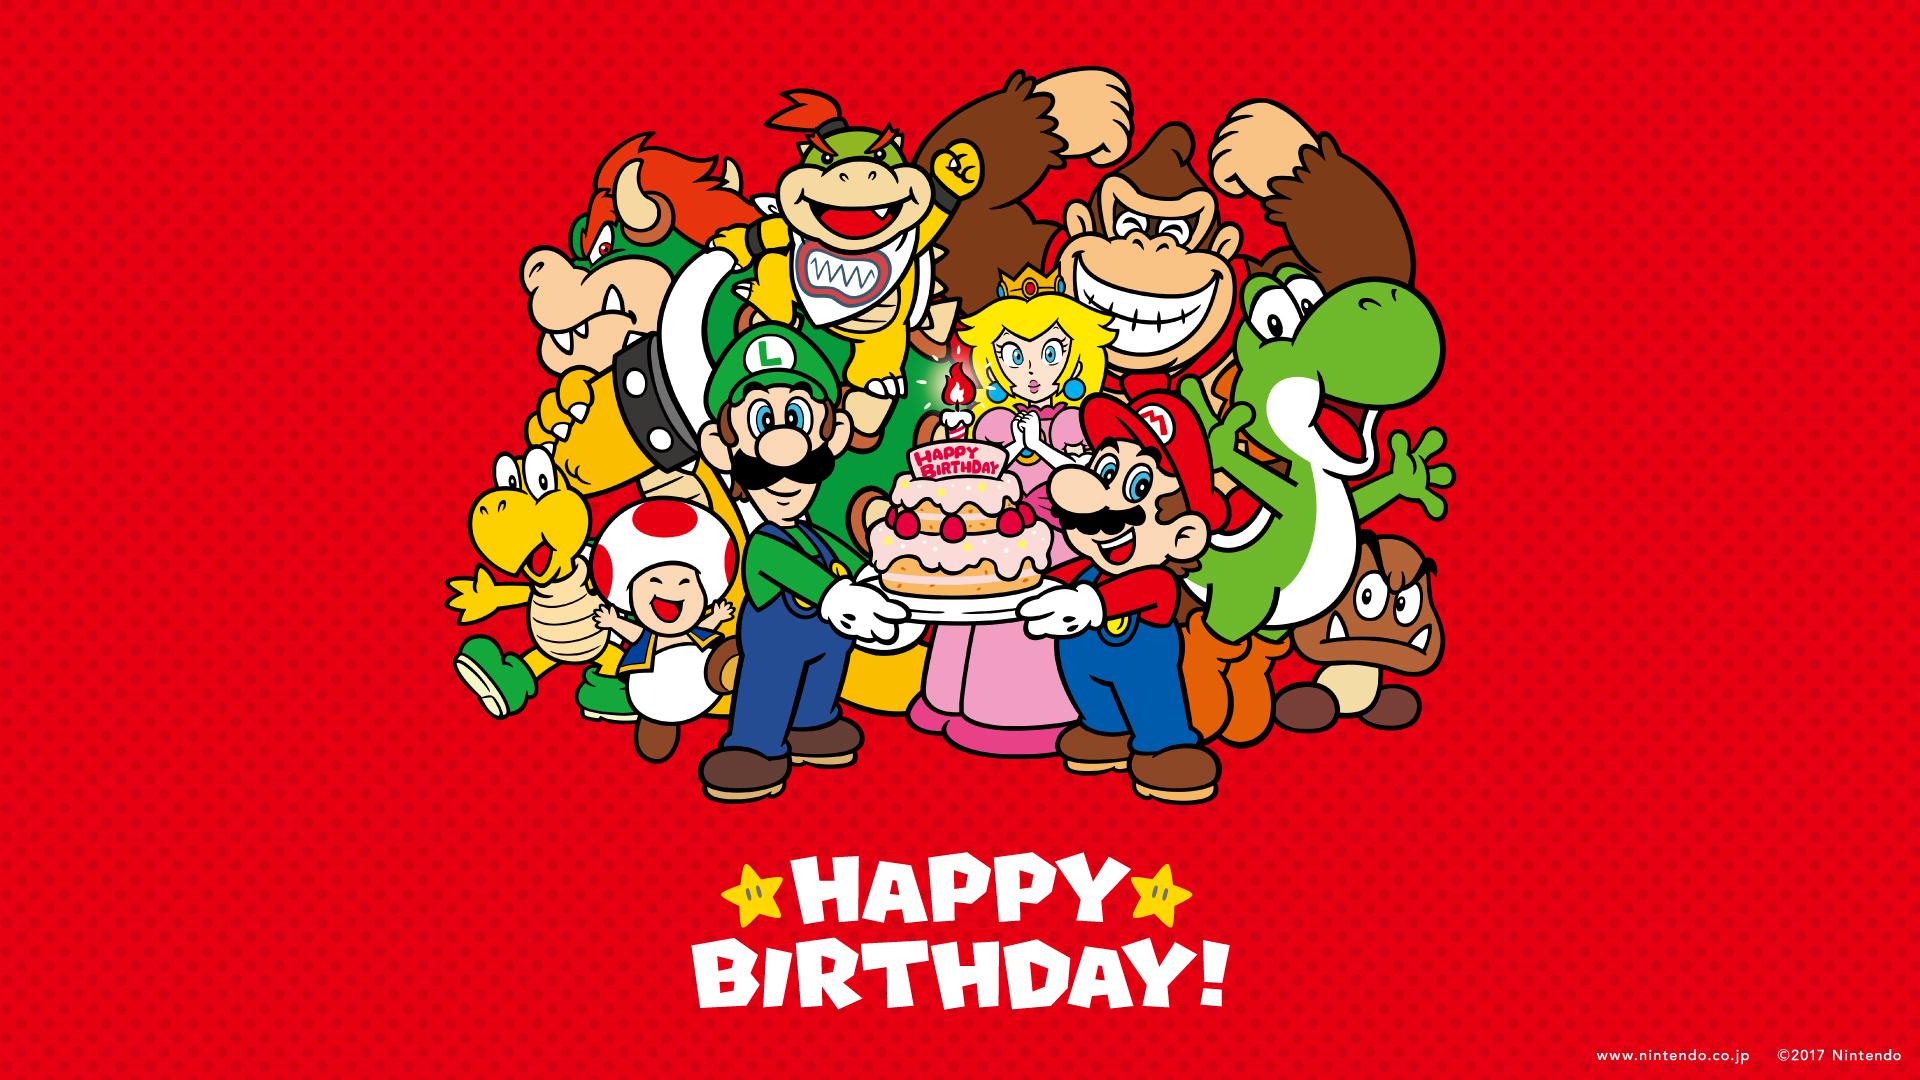 Nintendo Releases Super Mario Happy Birthday Wallpapers